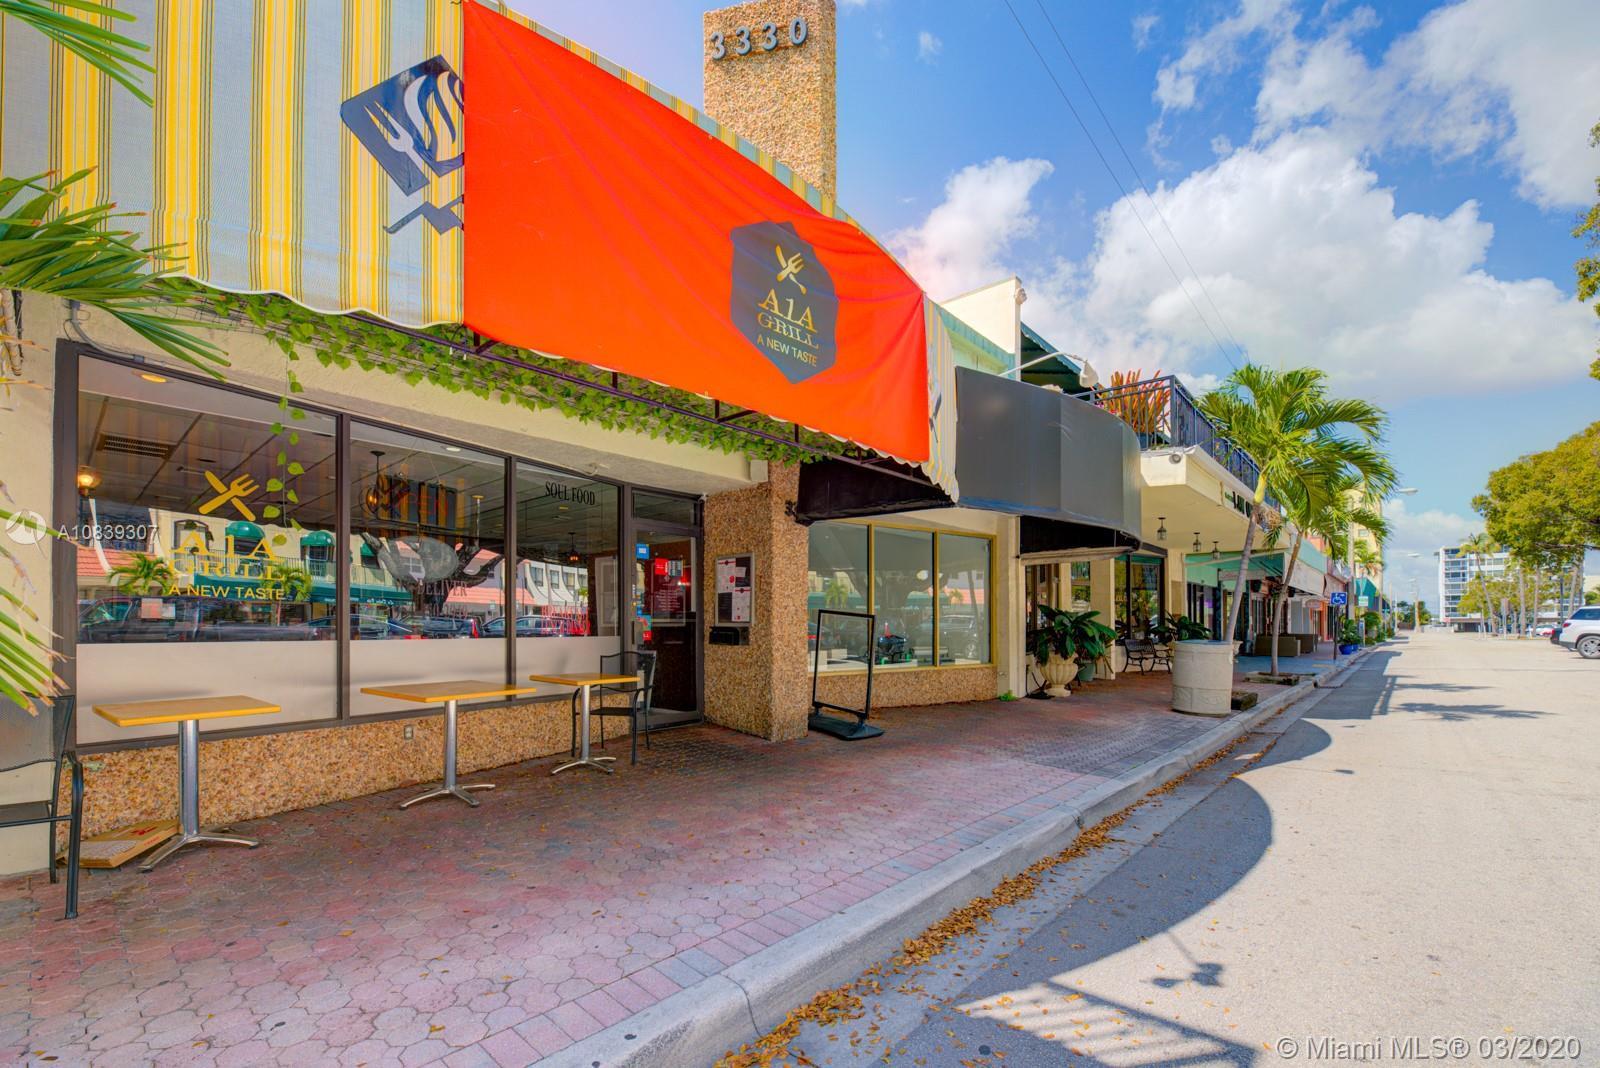 3330 NE 33Rd Street, Fort Lauderdale, Florida 33308, ,Commercial Sale,For Sale,3330 NE 33Rd Street,A10839307